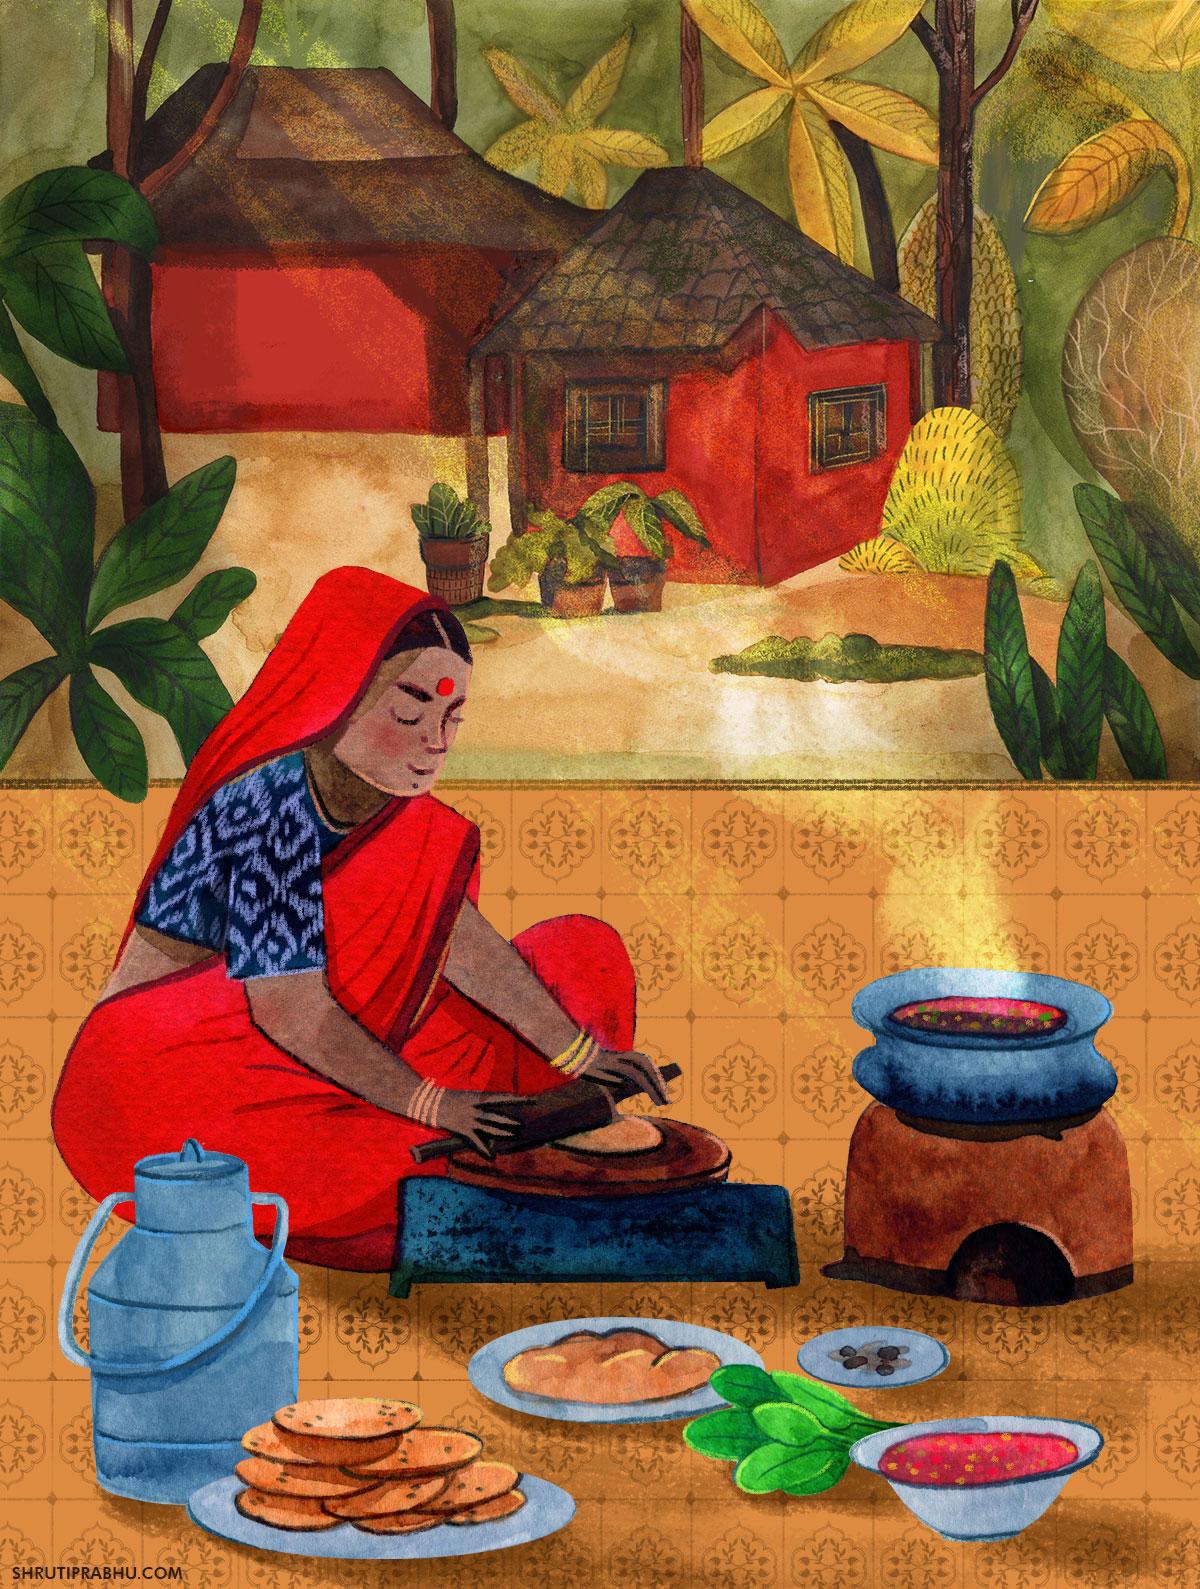 https://shrutiprabhu.com/wp-content/uploads/2019/07/ShrutiPrabhu_Illustration_Village_3_web.jpg